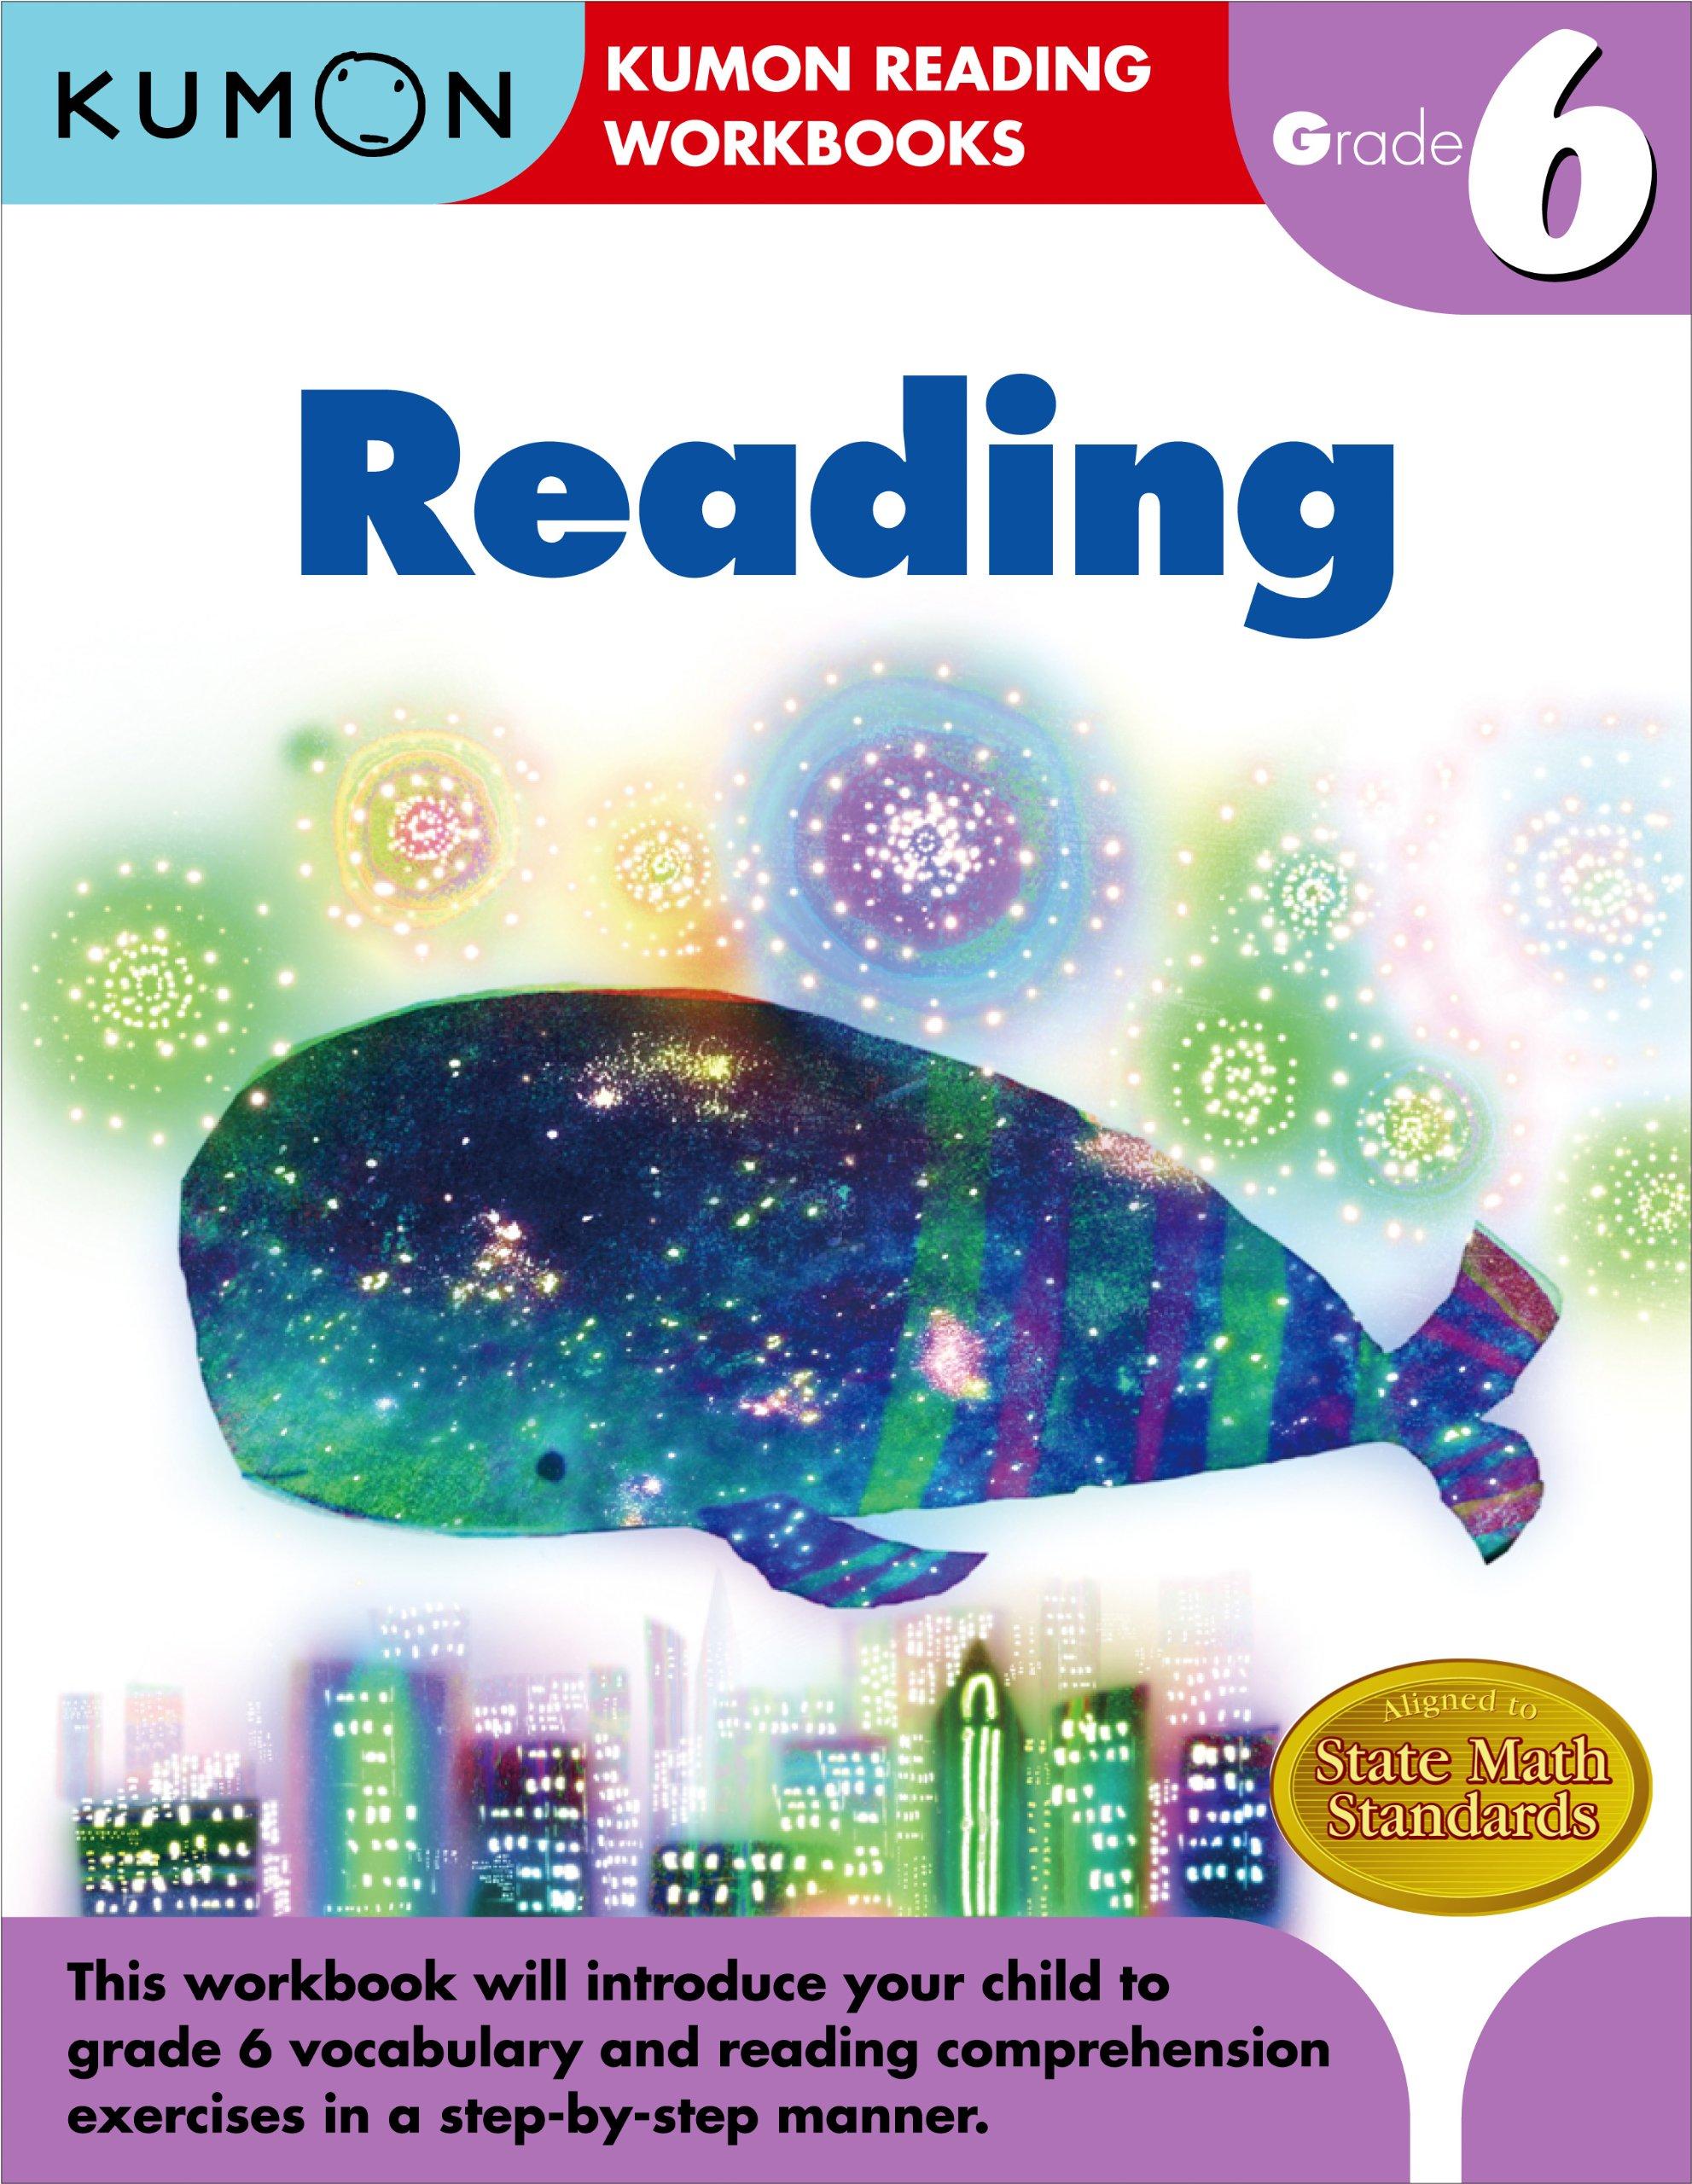 Worksheets Kumon Reading Worksheets amazon com grade 6 reading kumon workbooks 9781934968949 publishing books